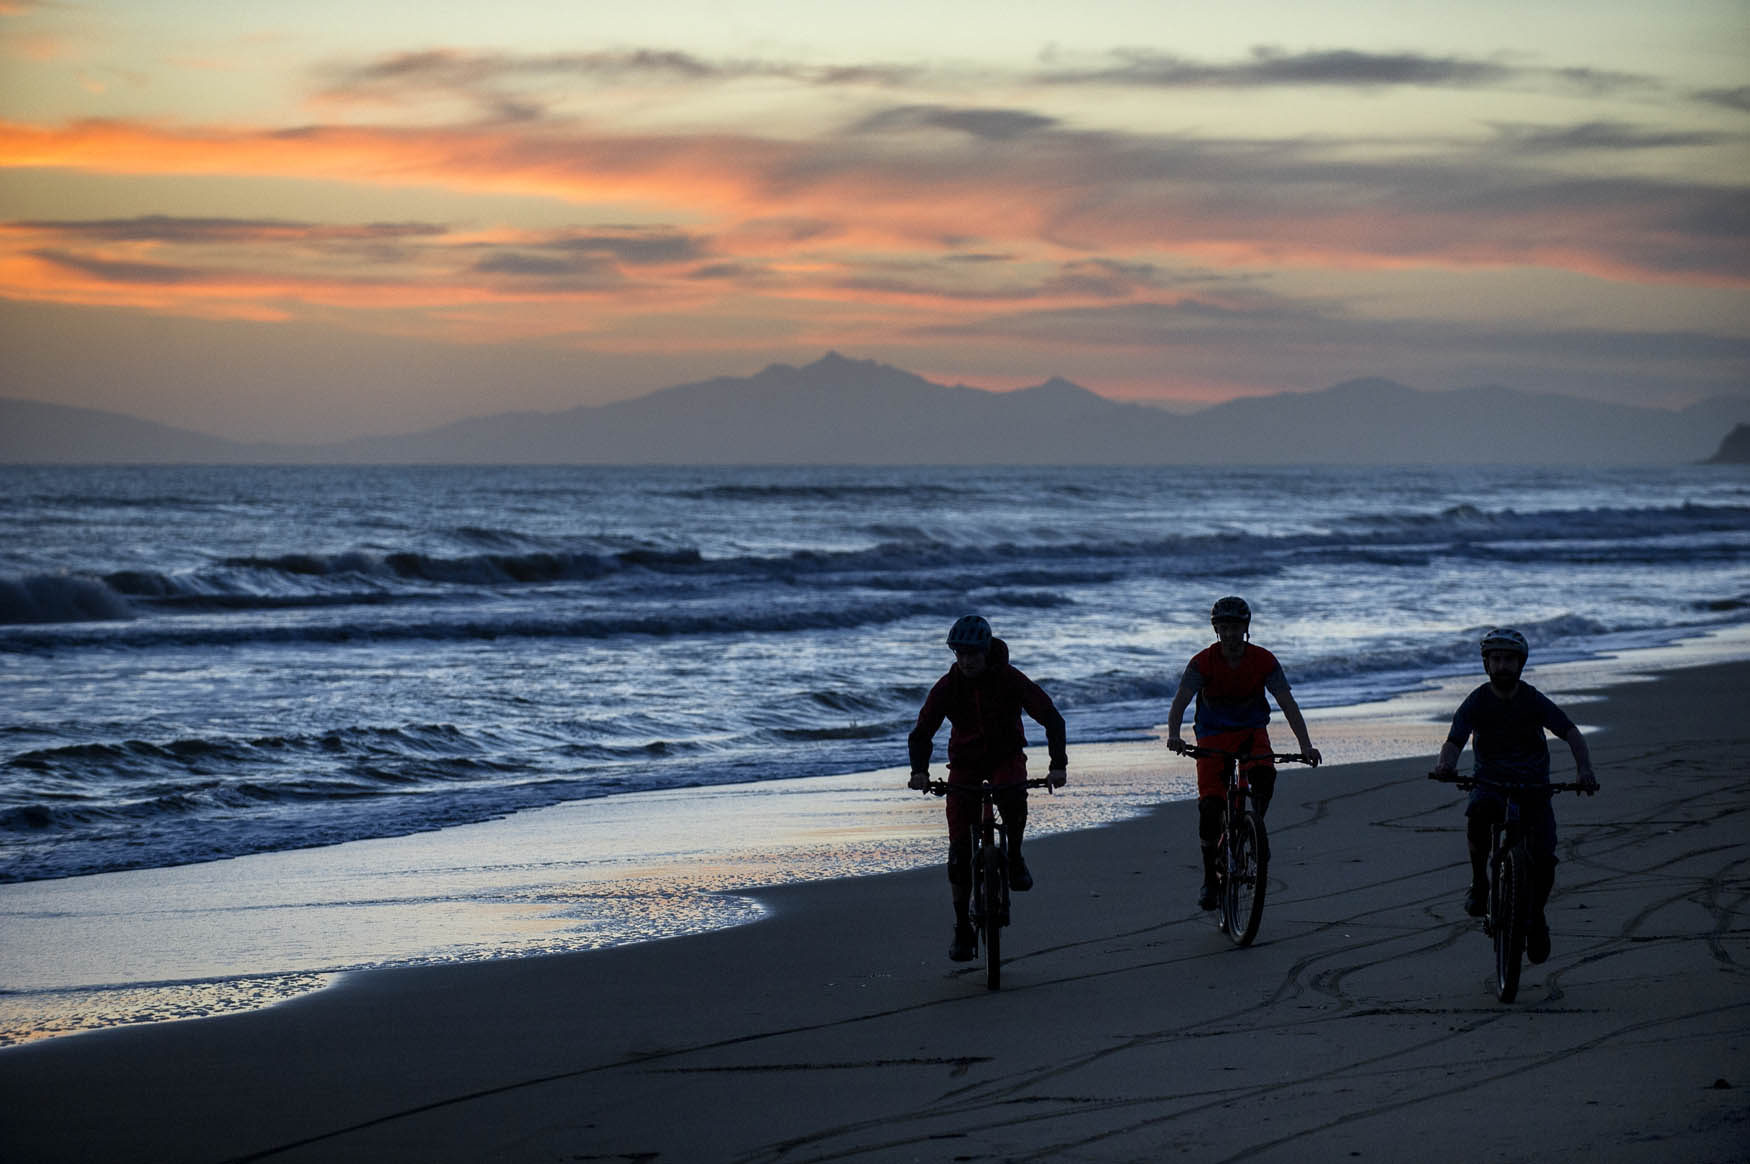 Mountain Biking UK Bike of the Year, Punta Ala, Tuscany  PIC © Andy Lloyd www.andylloyd.photography